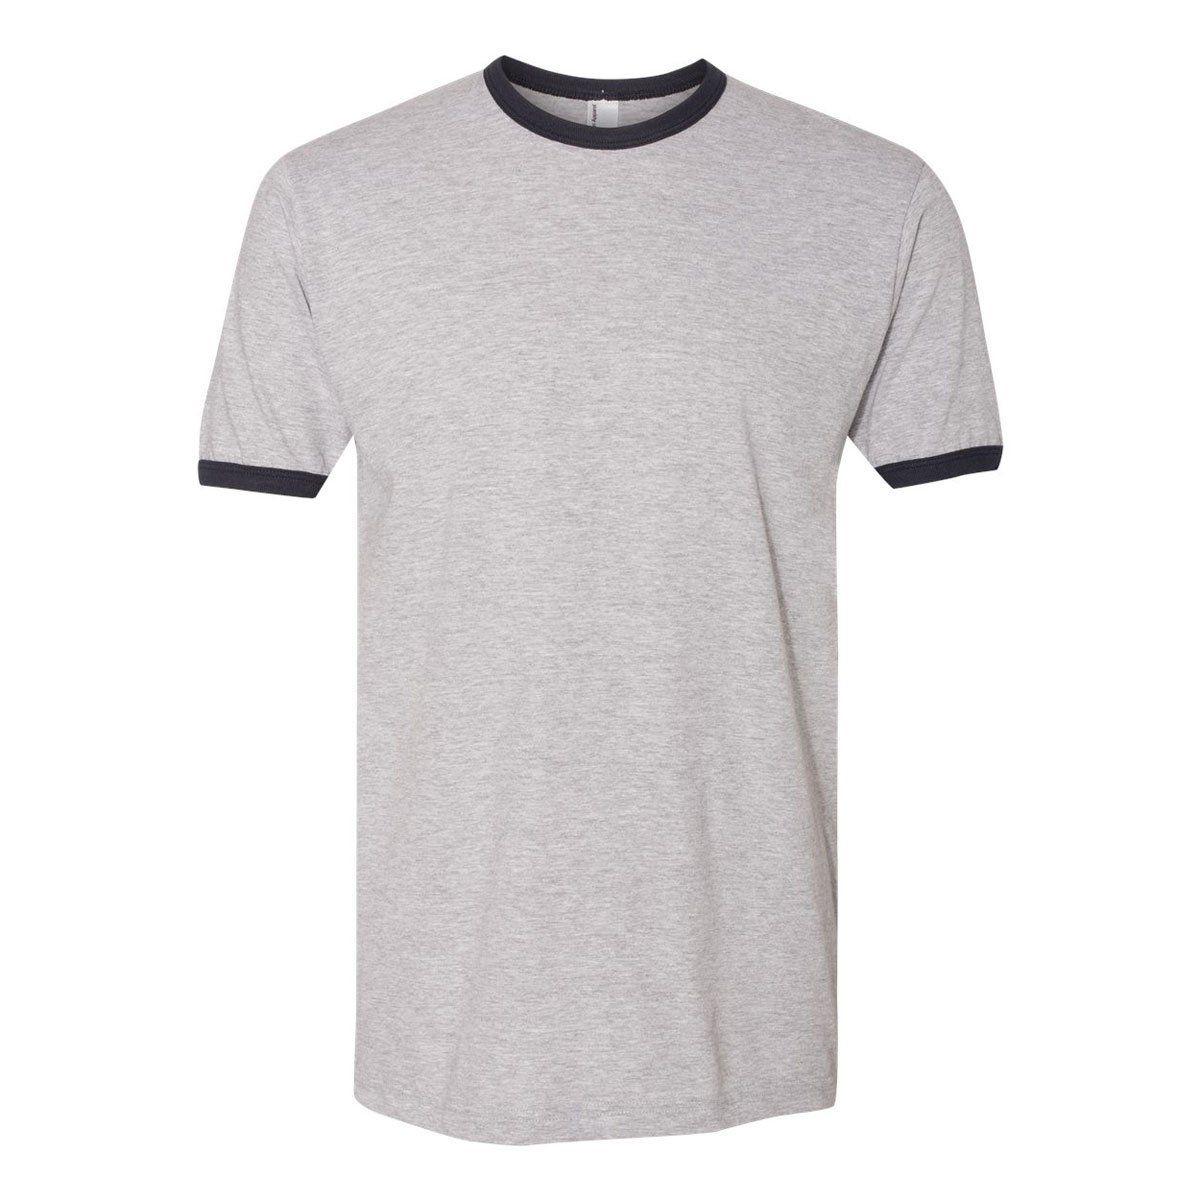 Download American Apparel Unisex Heather Grey Navy Fine Jersey Ringer T Shirt American Apparel American Shirts Shirt Design Inspiration